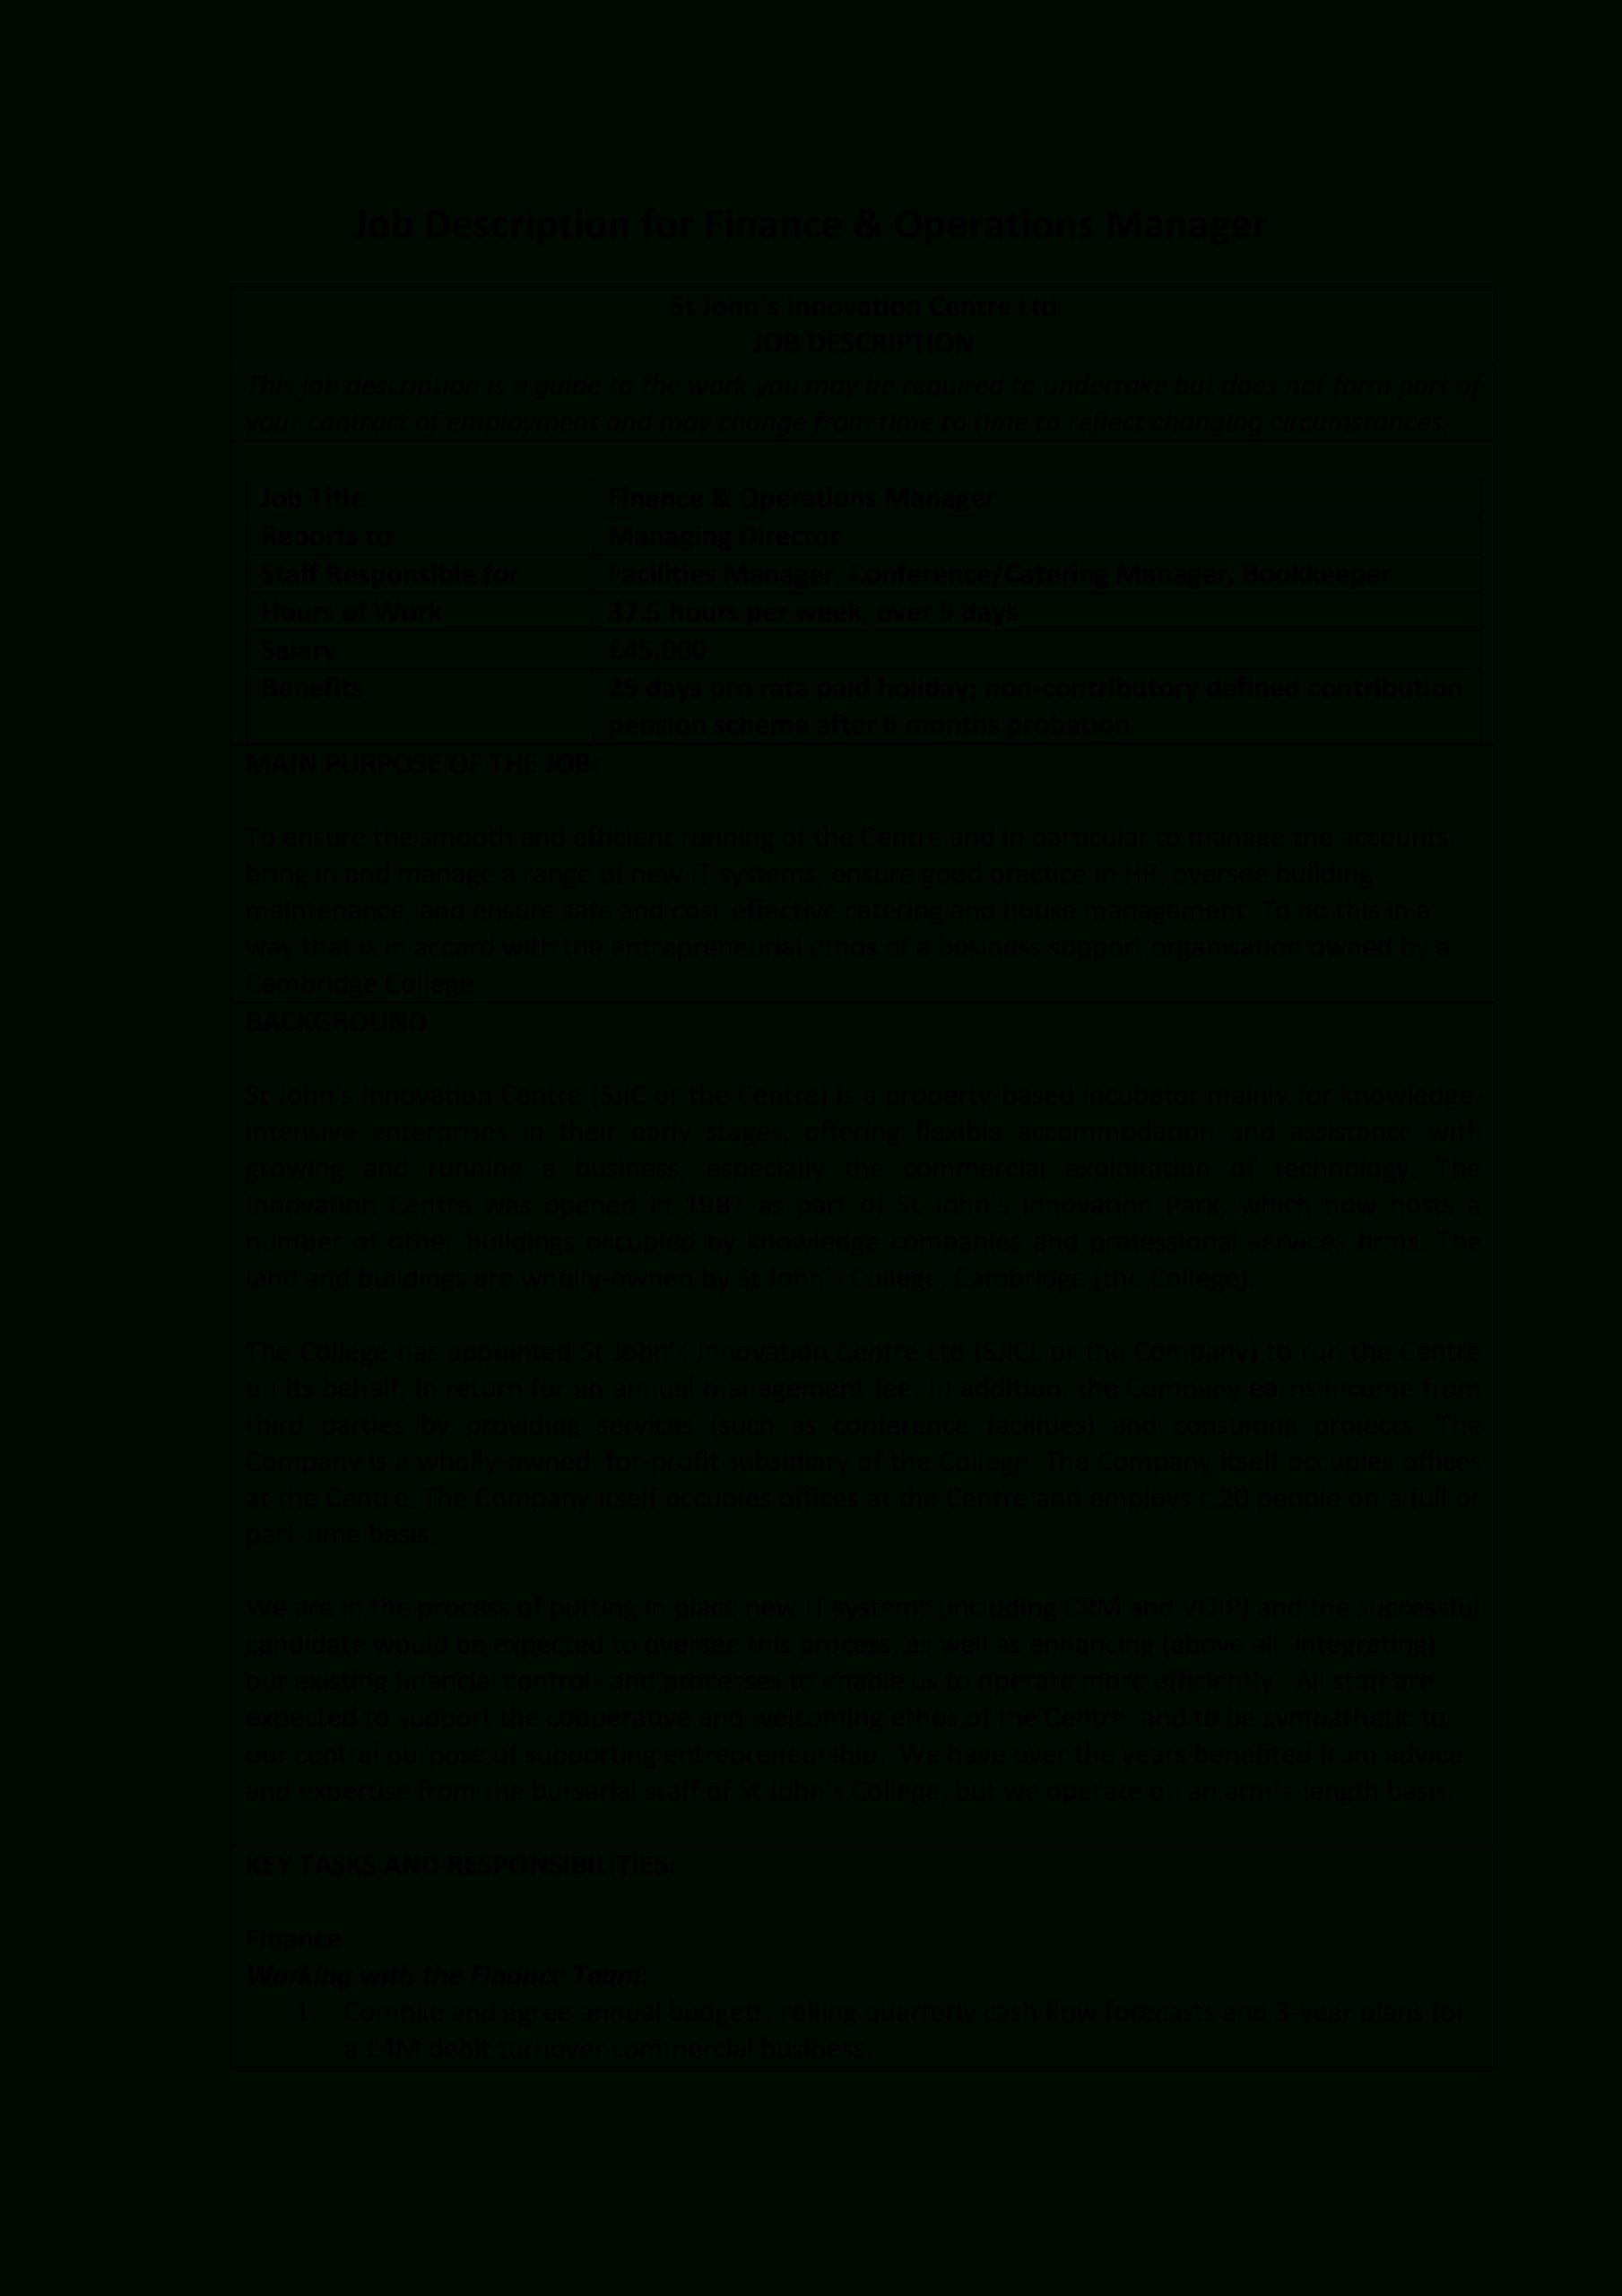 Financial Operations Manager Job Description | Templates At regarding Operations Manager Report Template